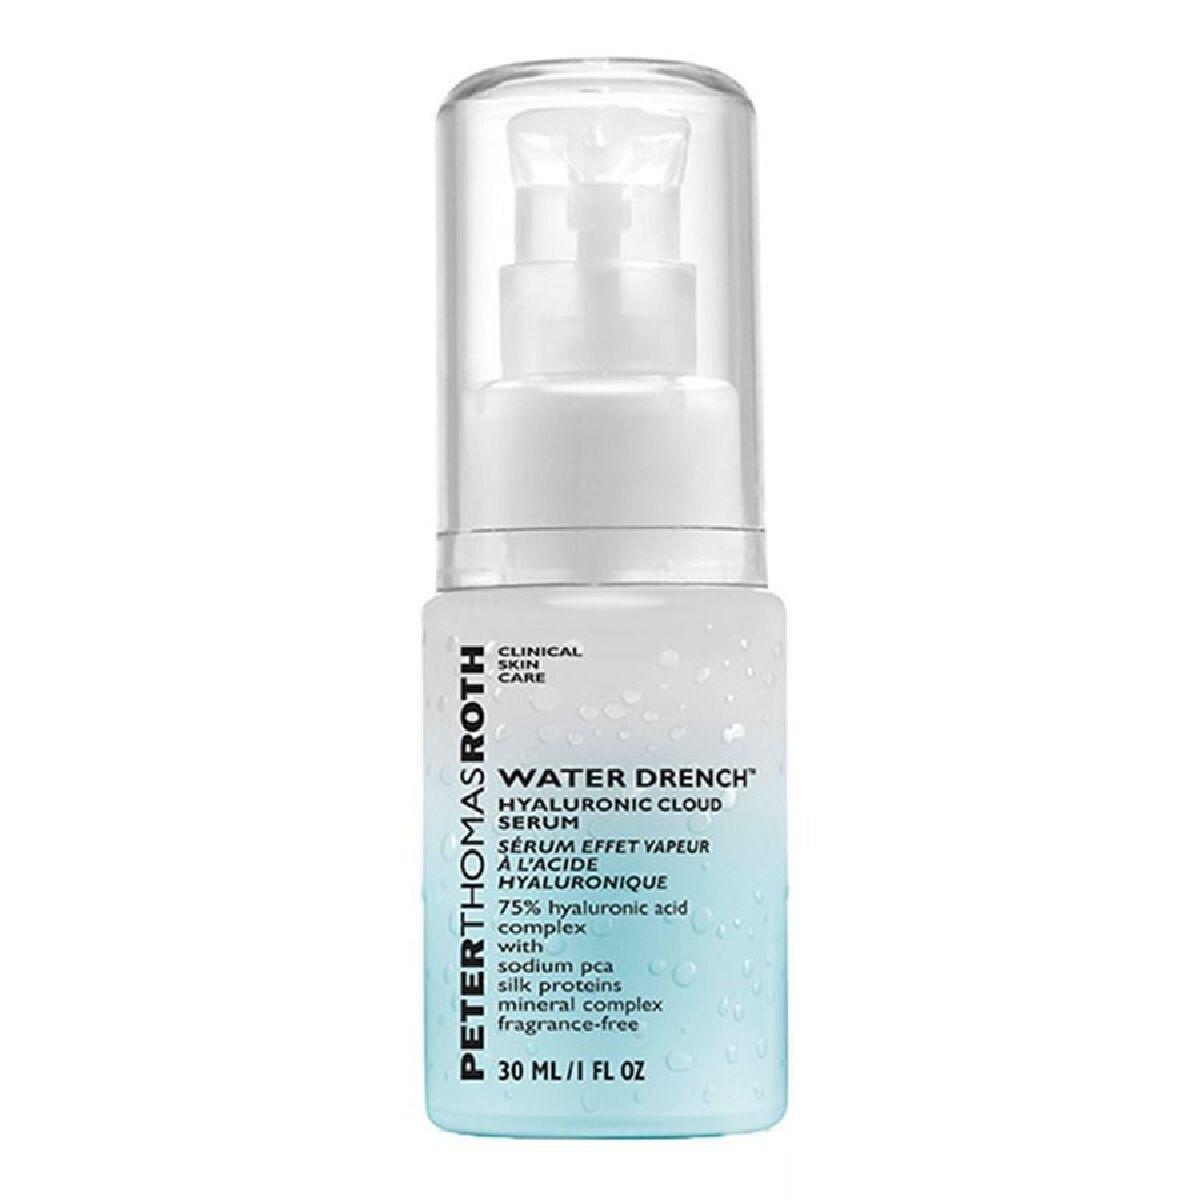 Peter Thomas Roth Water Drench™ Hyaluronic Cloud Cream Serum